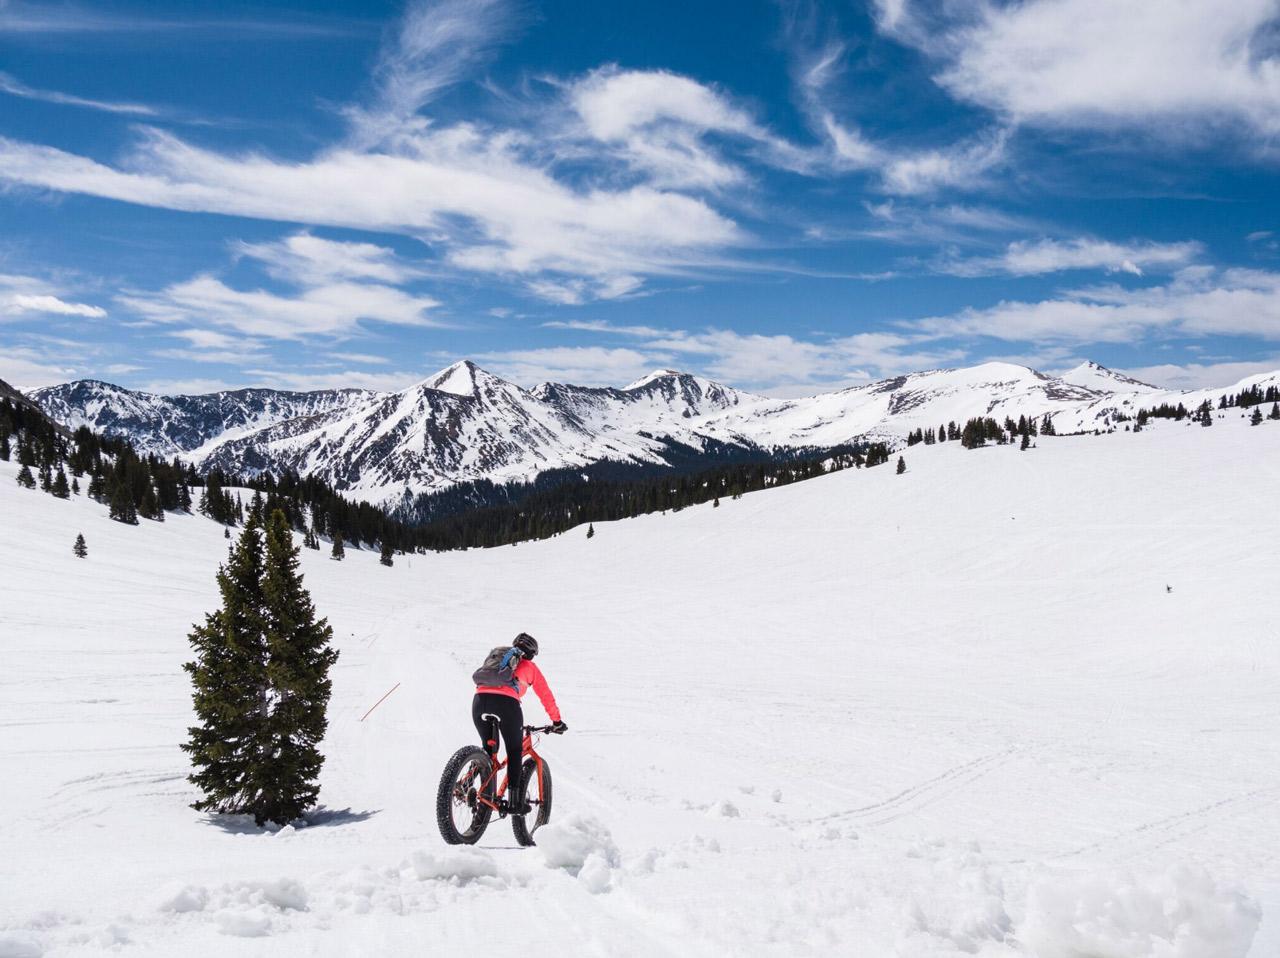 RBR_cottonwood-pass-summit_04